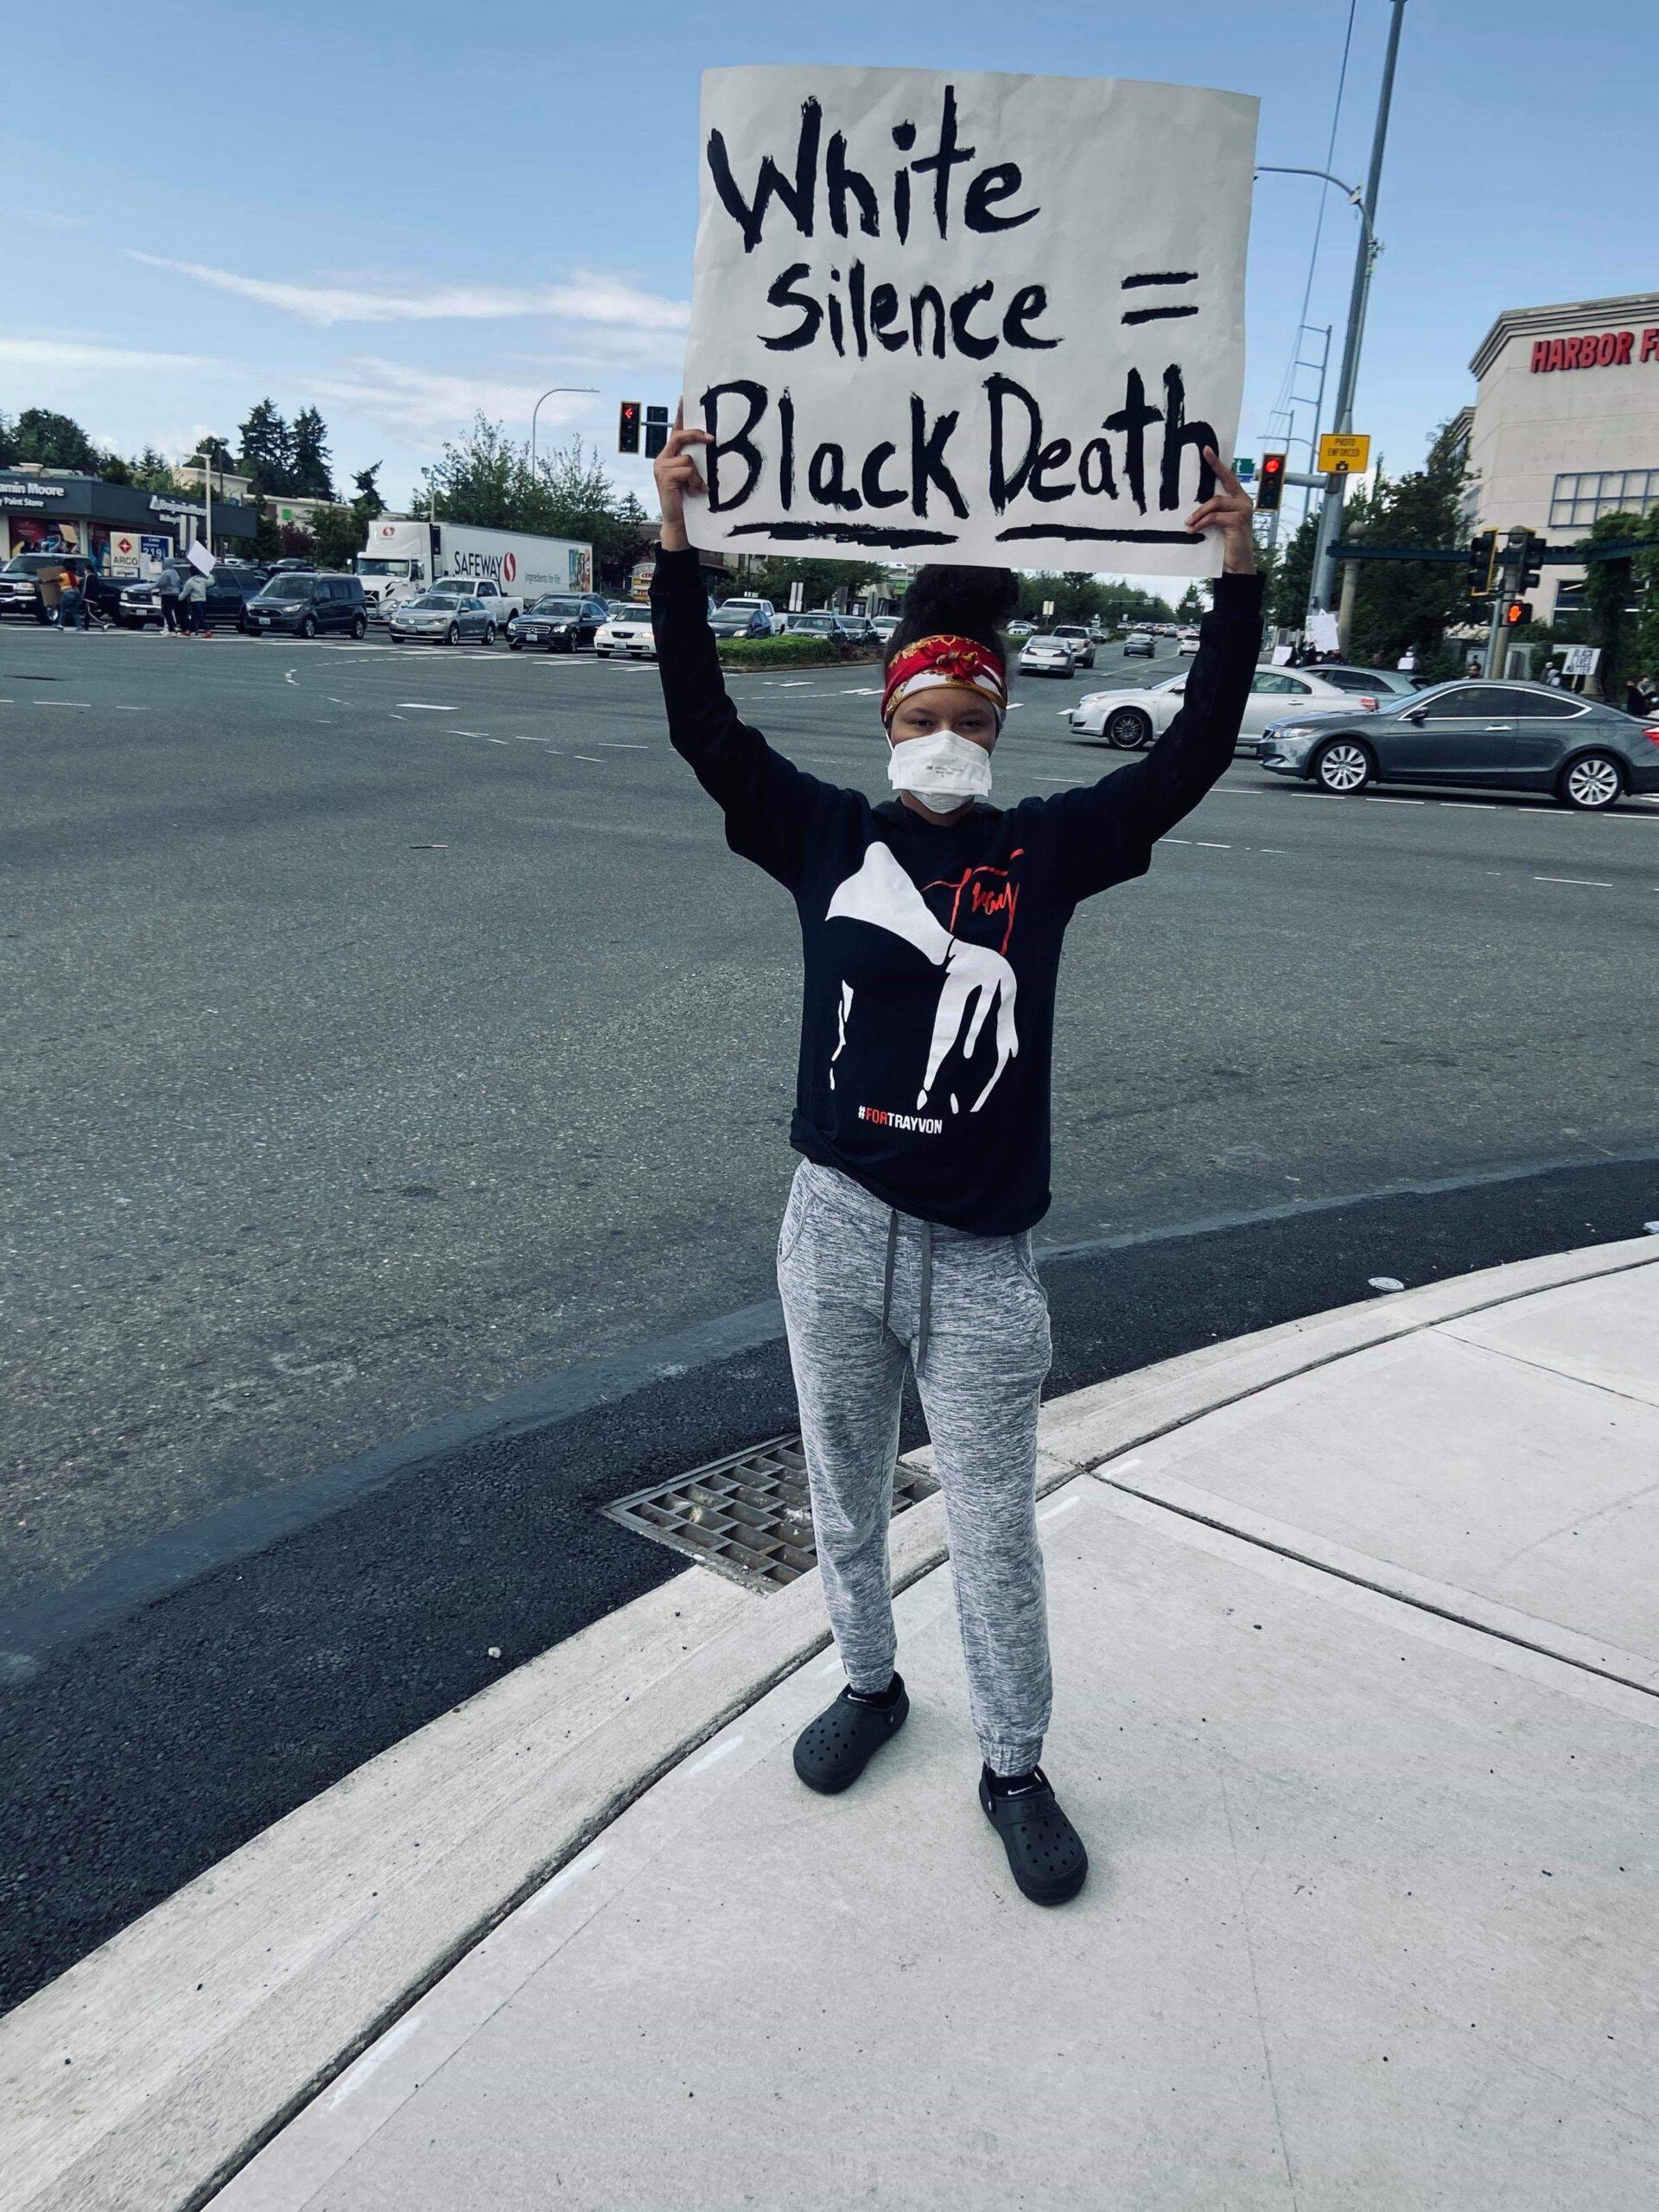 Saudia sanders, federal way protest, george floyd, blm, black lives matter, blm protest, auburn wa protest, black live matter protest, peaceful protest